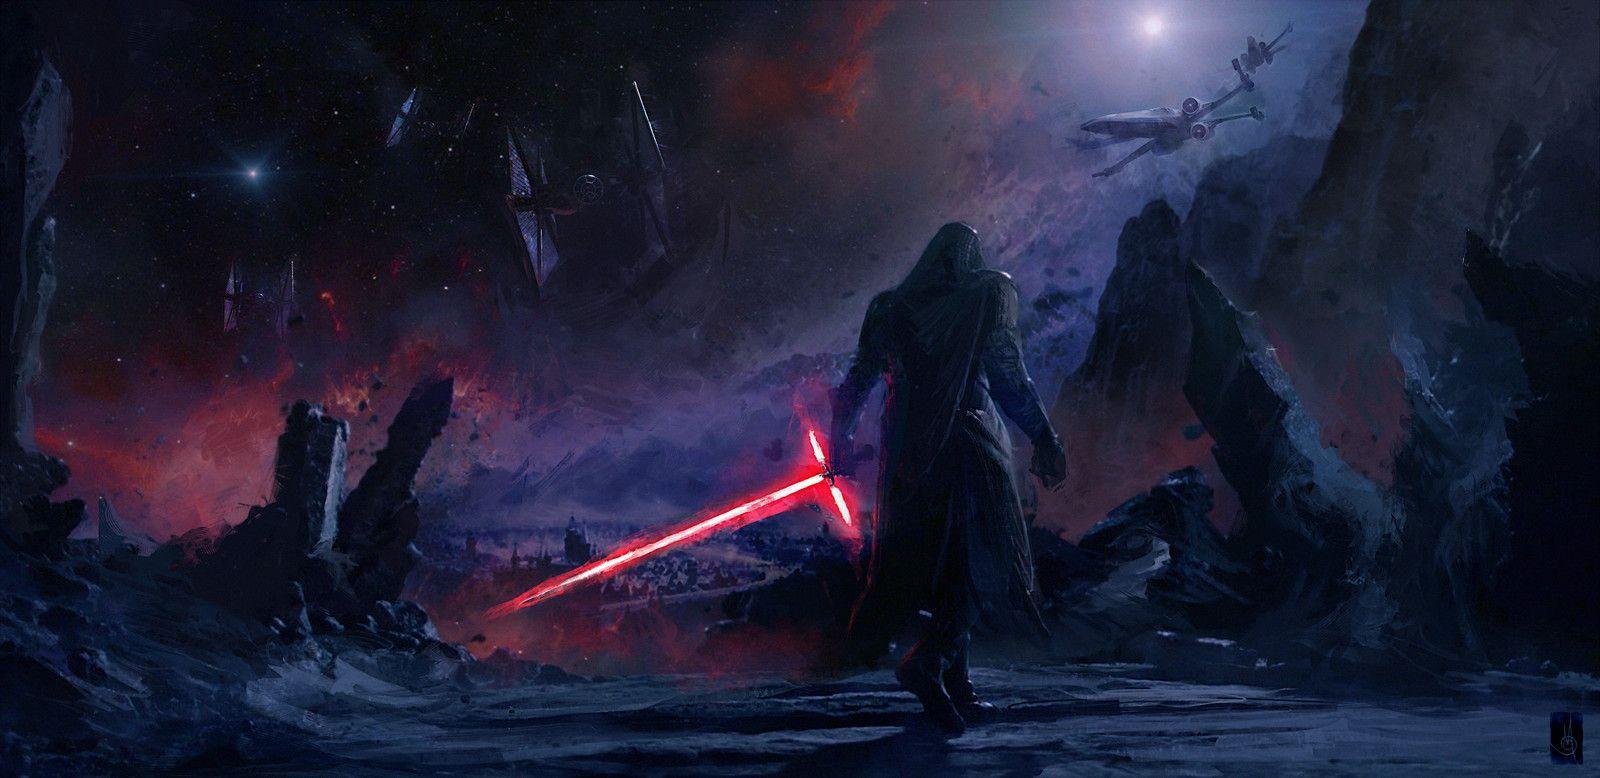 Lightsaber Wallpaper The Last Jedi 1920x1080 Reddit Hd